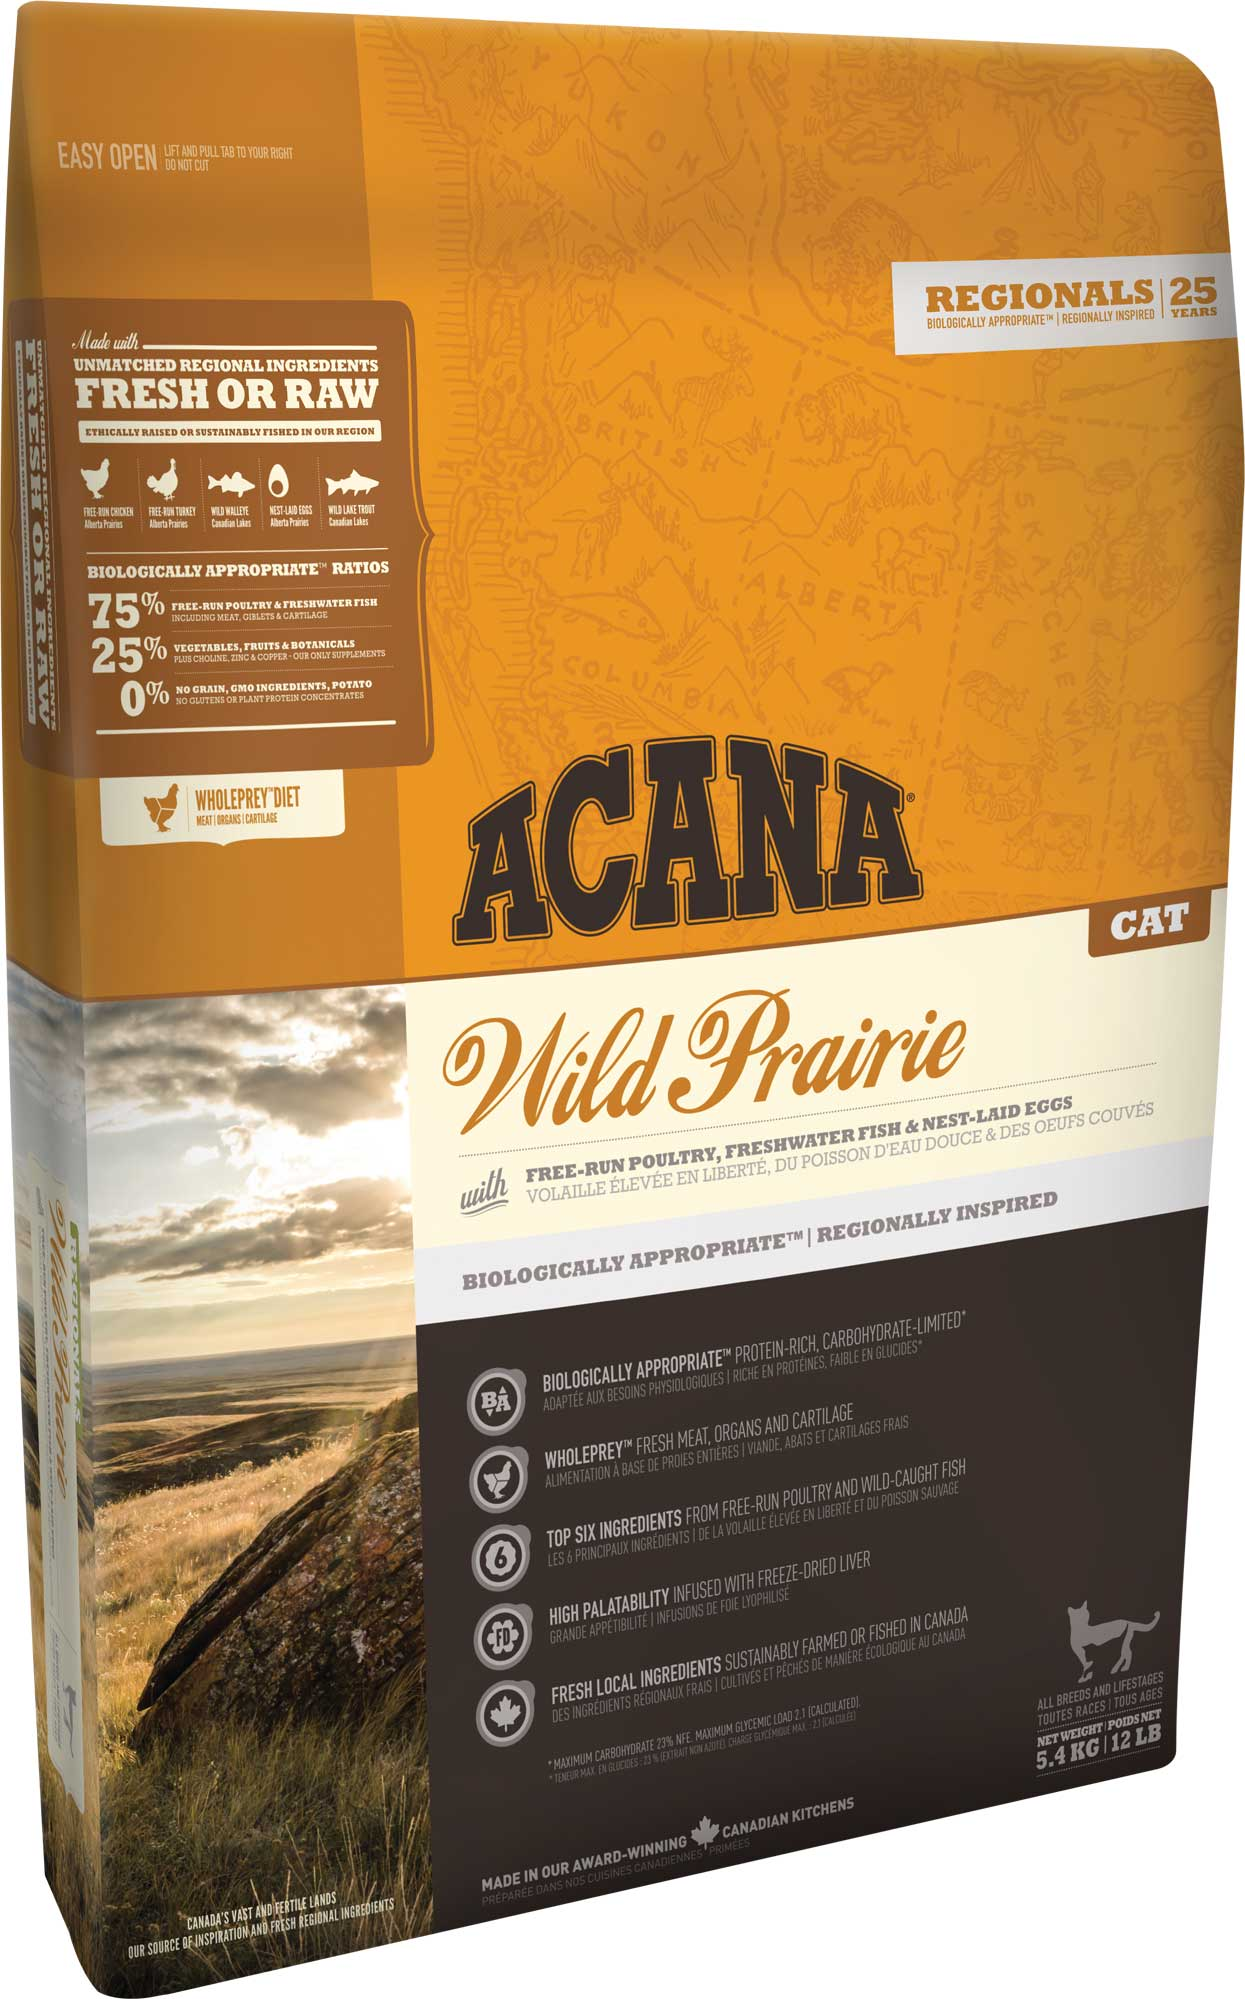 ACANA Wild Prairie Cat & Kitten 5.4 kg